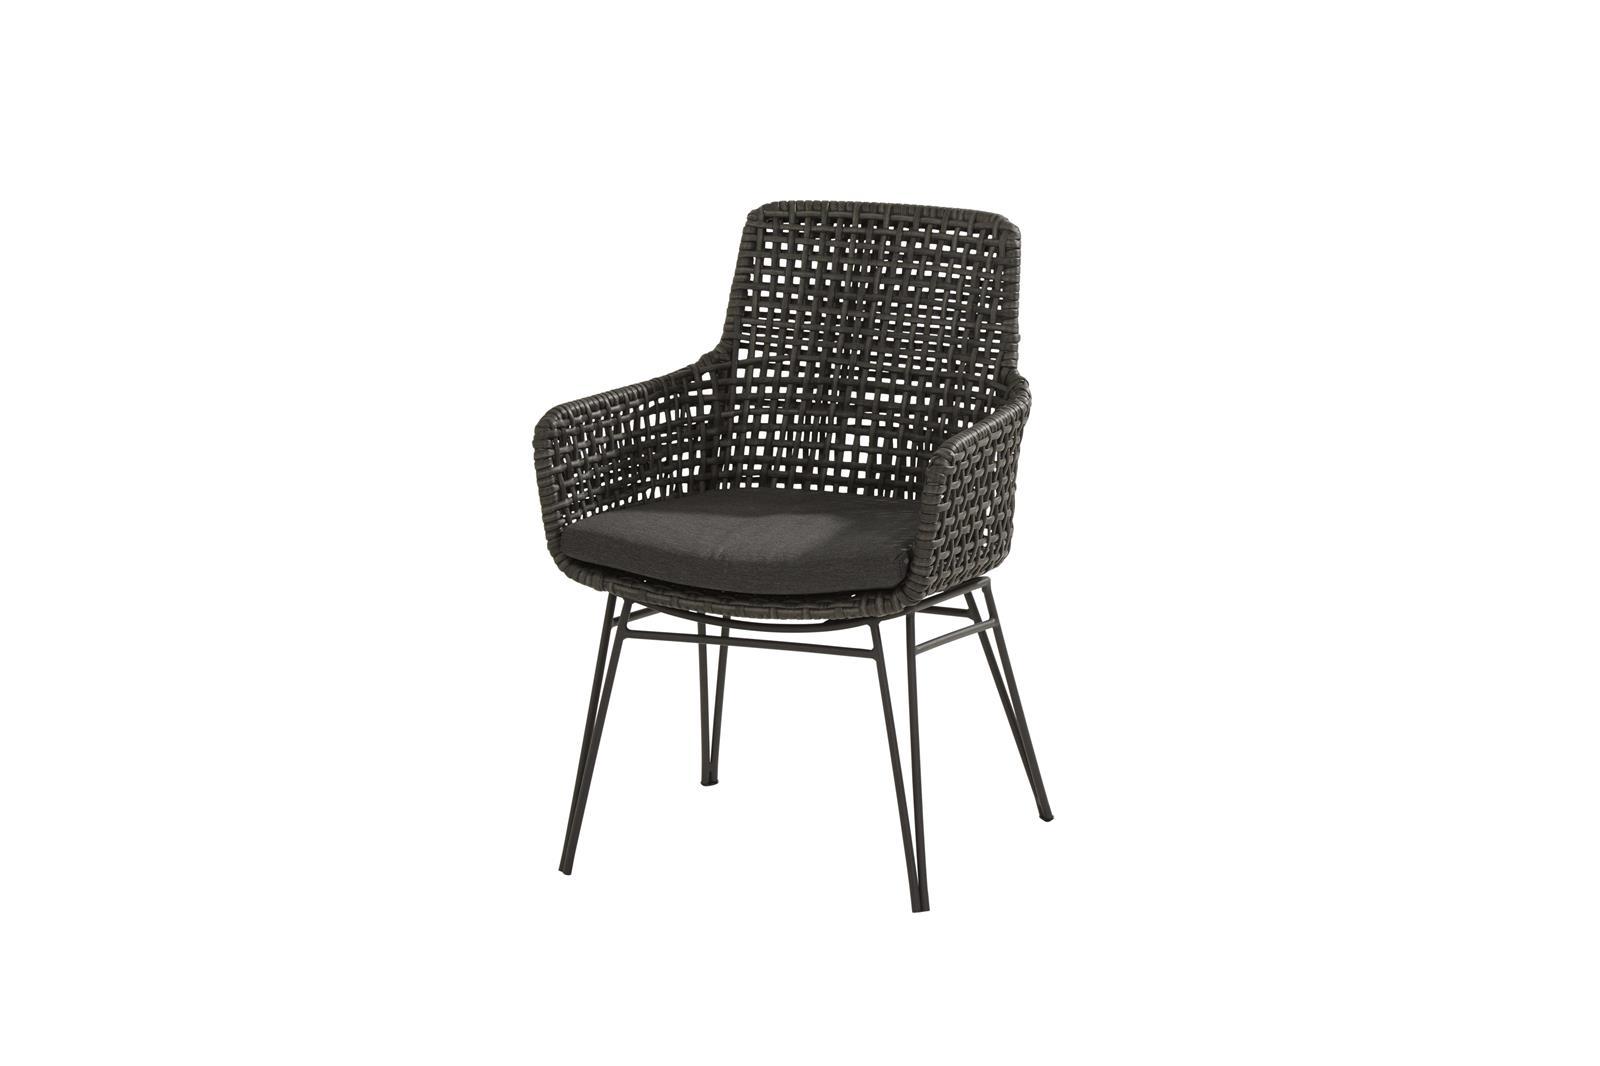 91073_ Opera dining chair with cushion 01.jpg